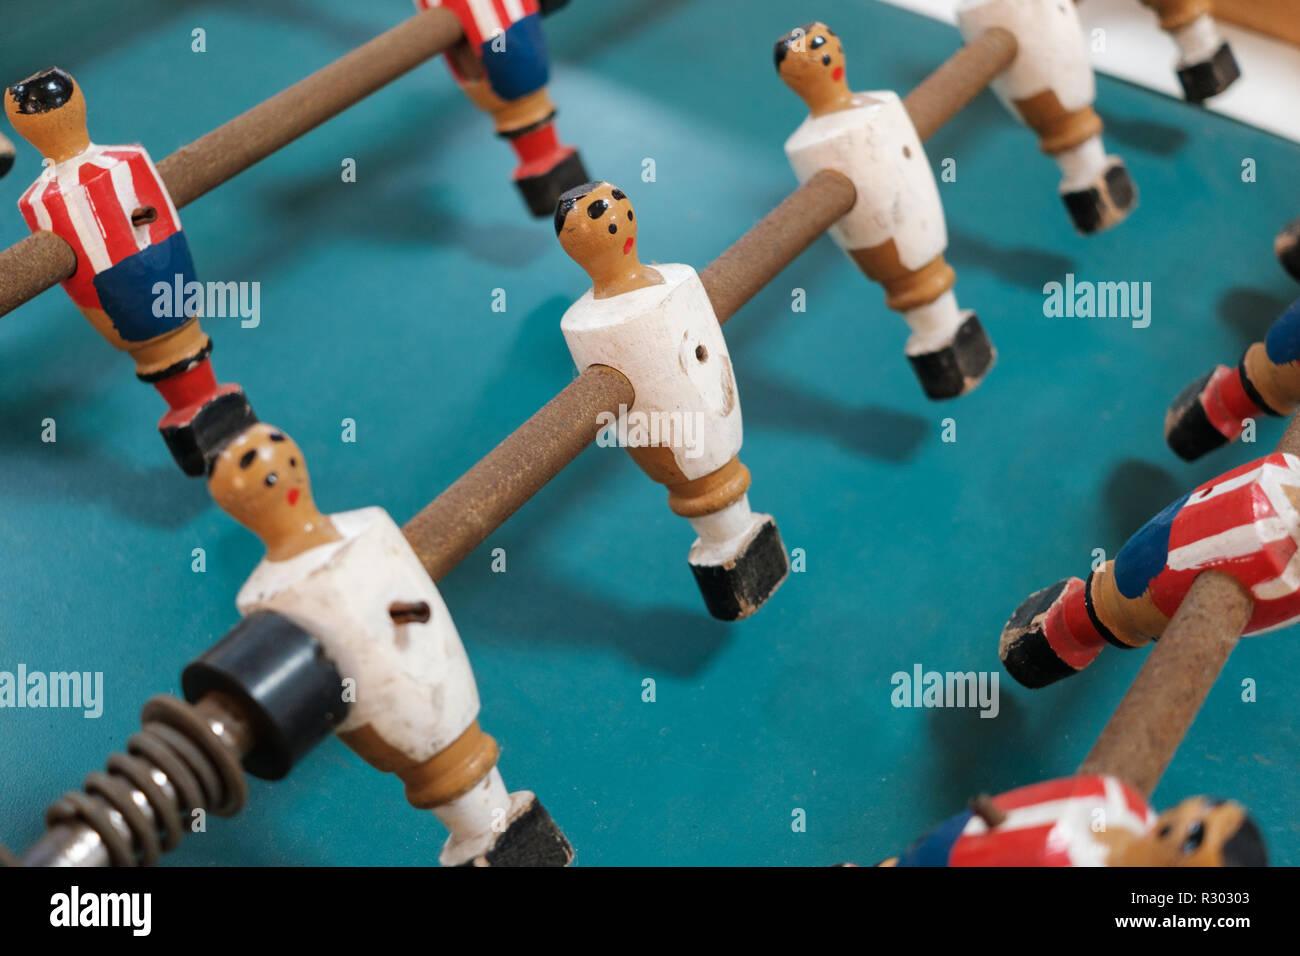 table soccer figures - table football player closeup - - Stock Image